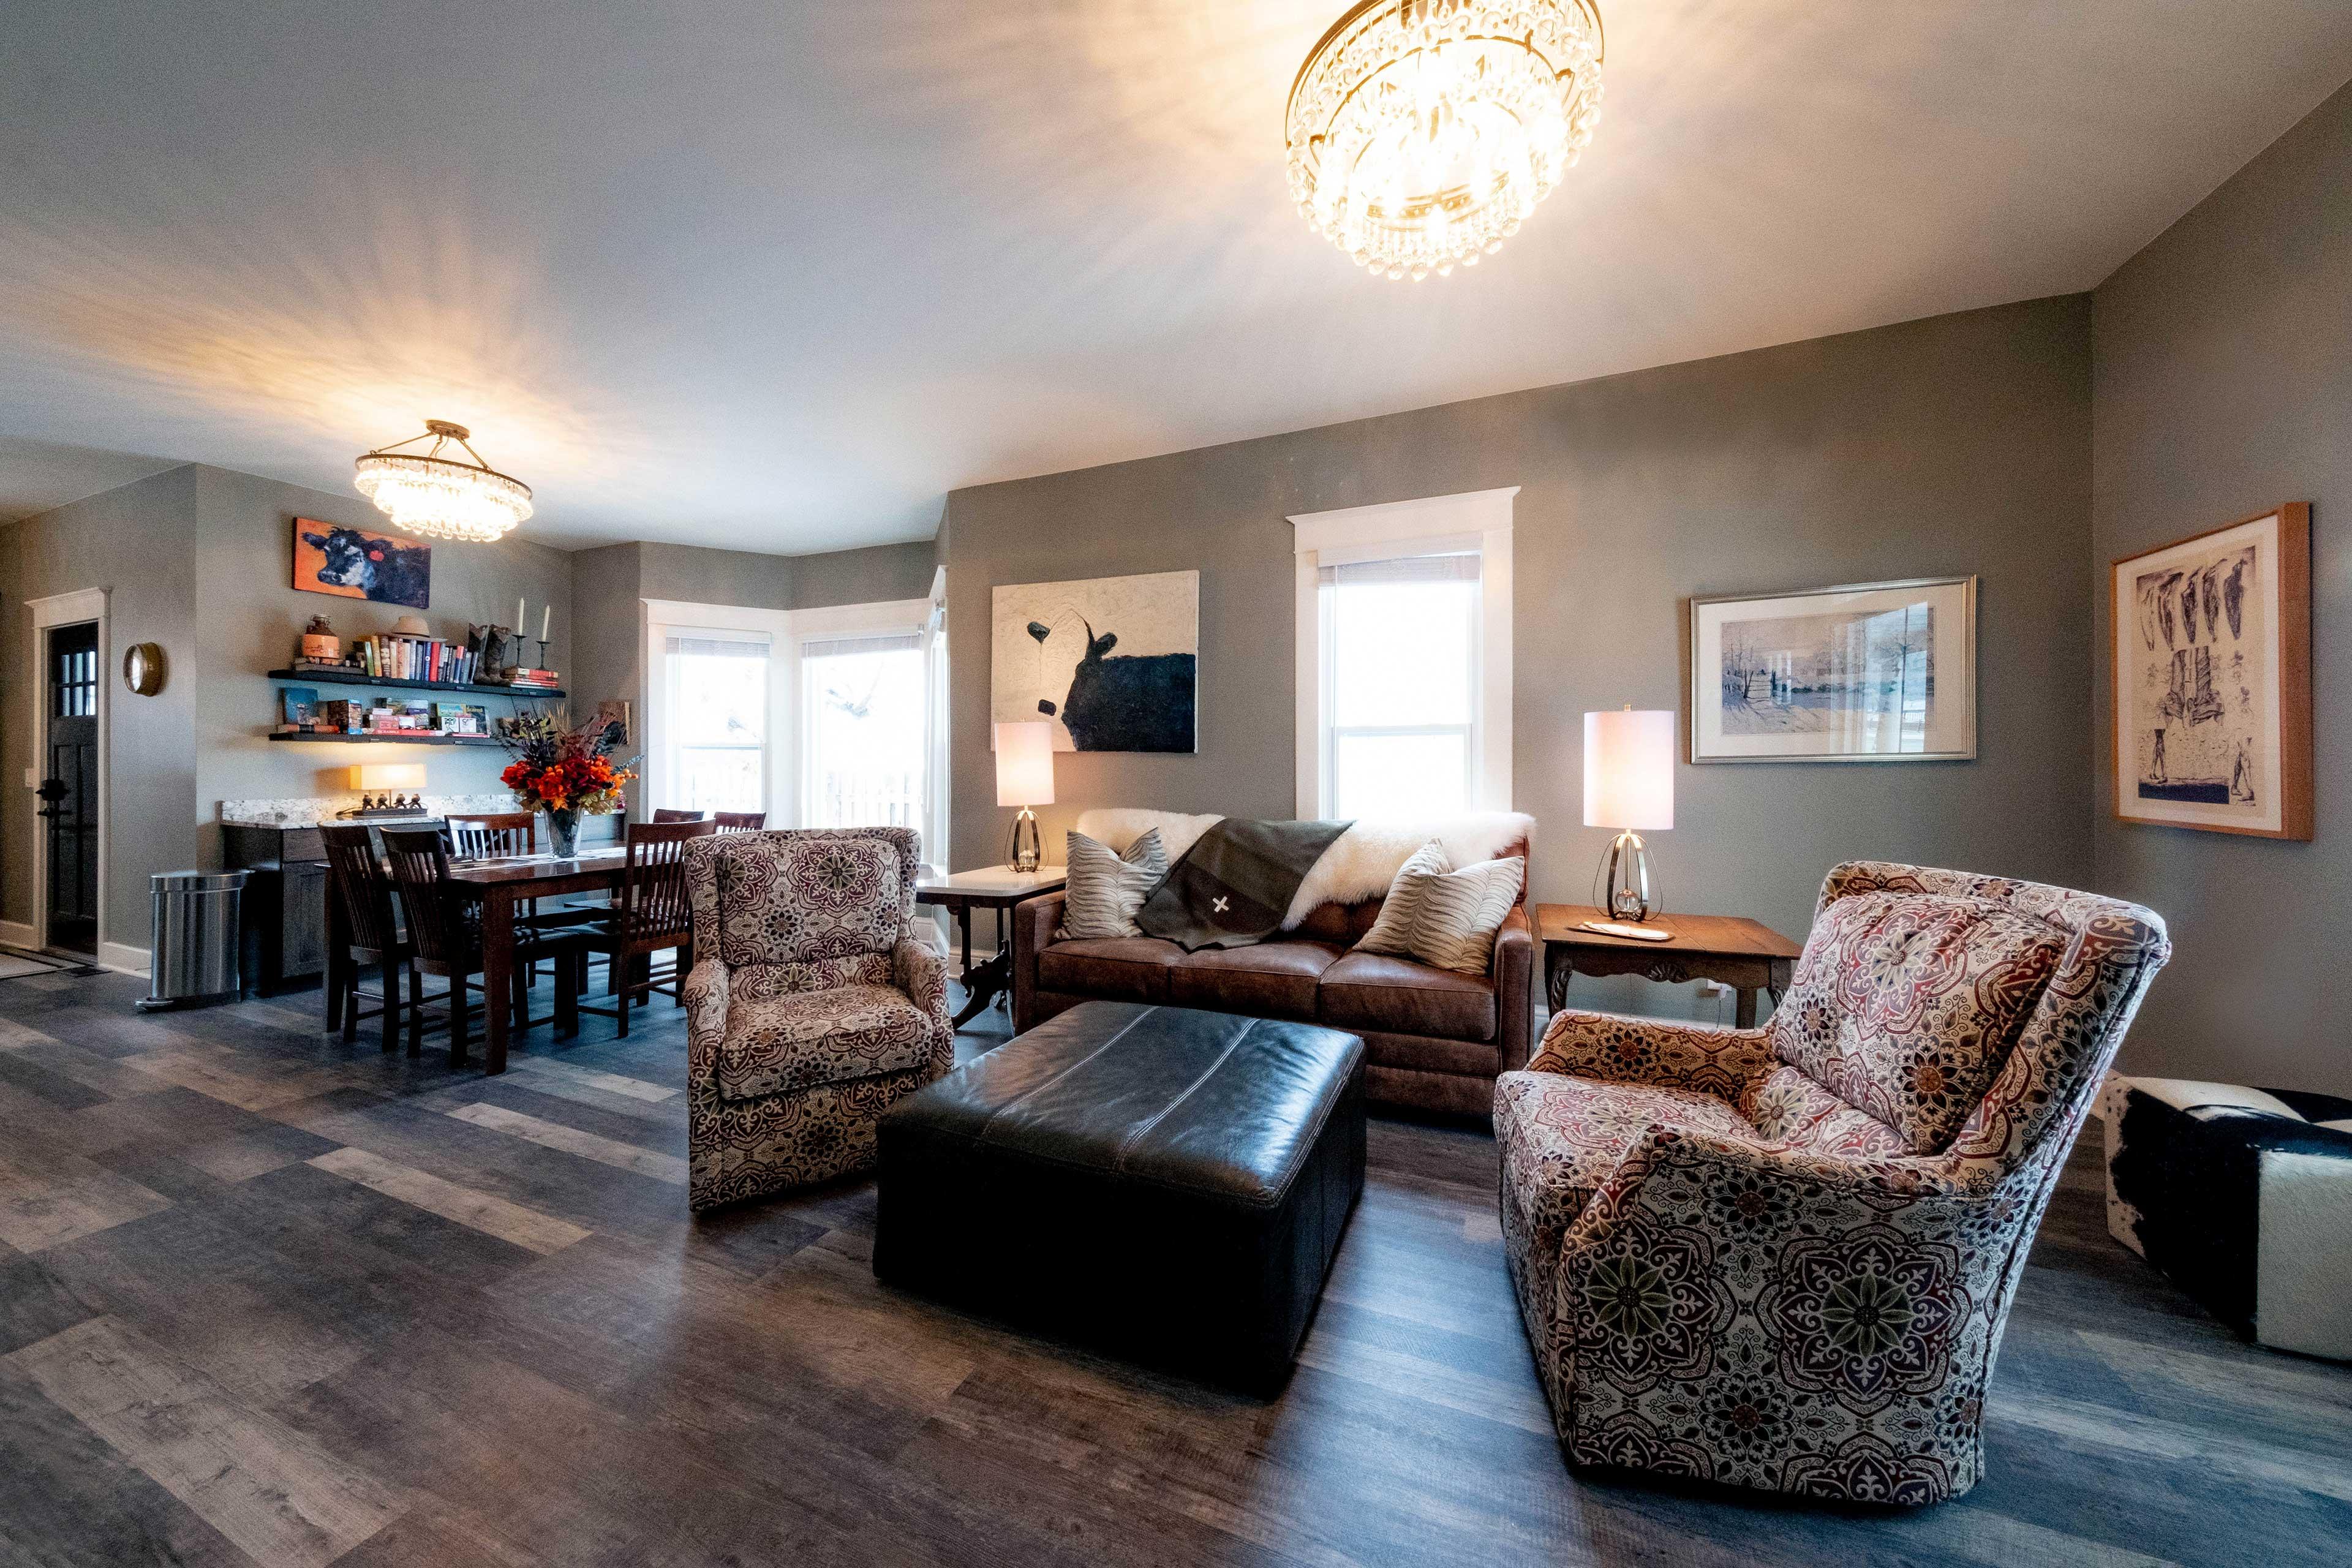 Sheridan Vacation Rental | 2BR | 1BA | 1,100 Sq Ft | Single-Story Home